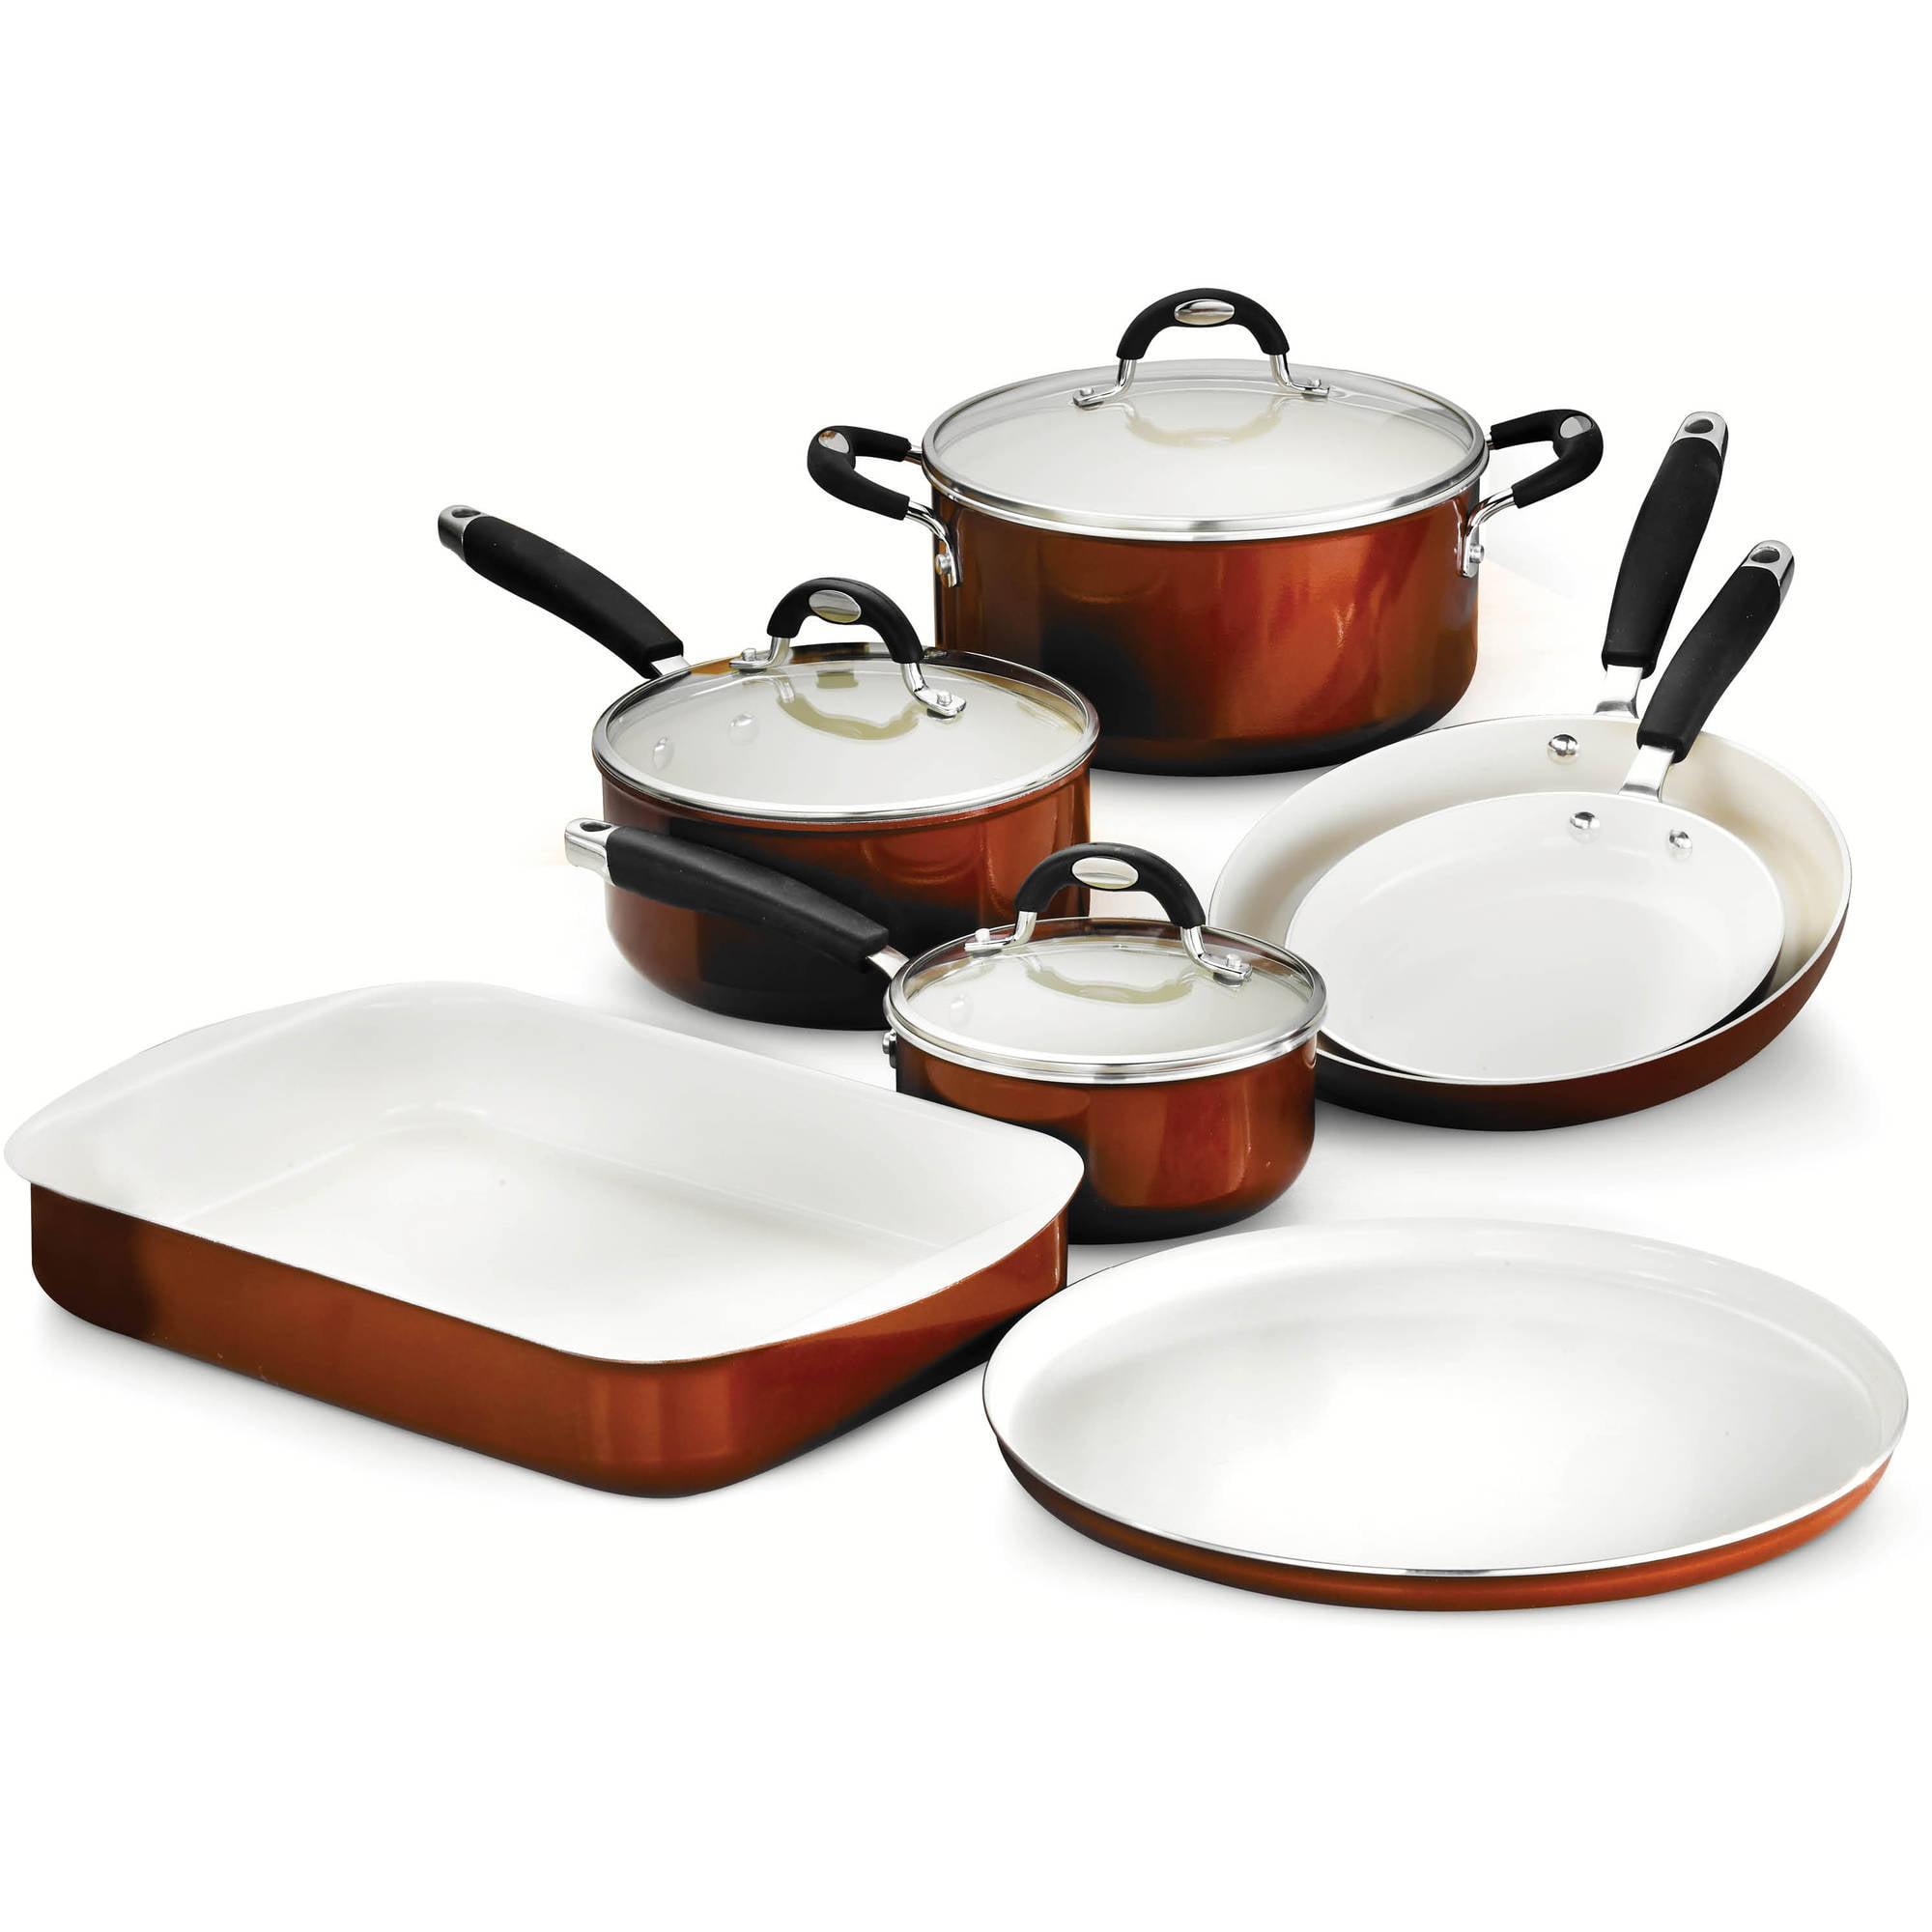 Tramontina Style 10-Piece Cookware/Bakeware Set, Metallic Copper